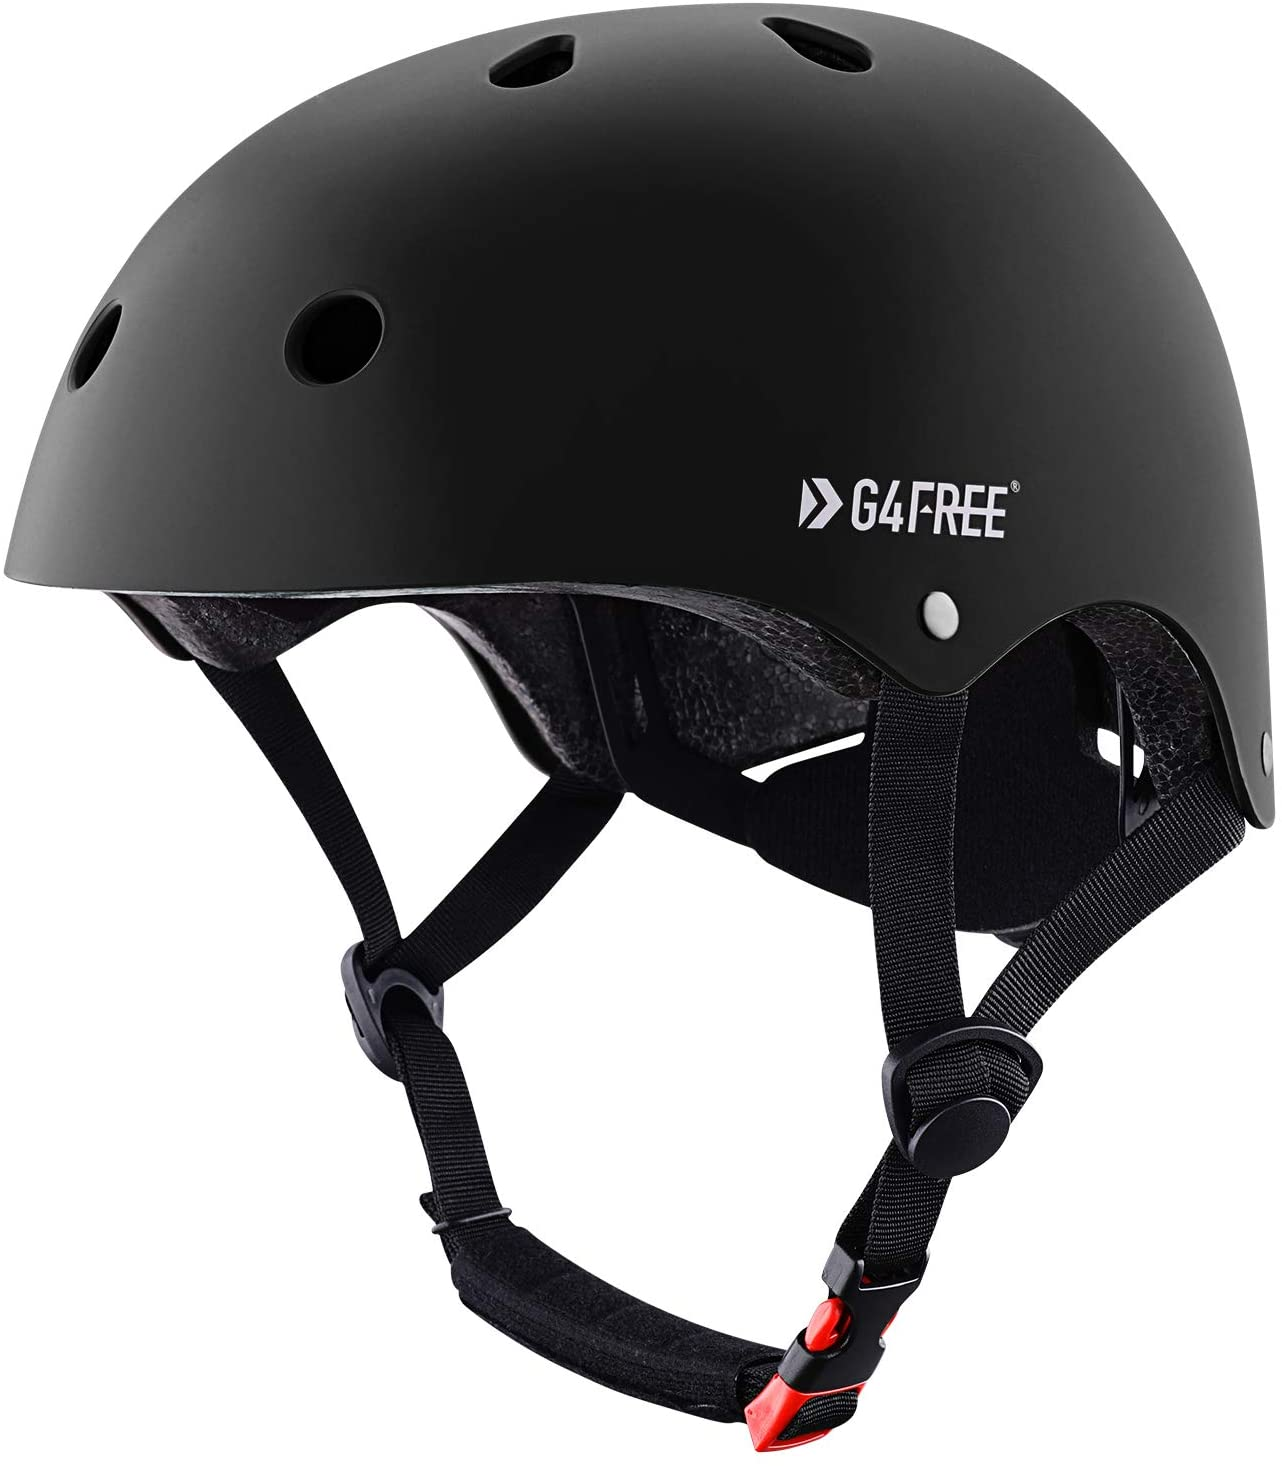 G4Free Skateboard Helmet CPSC Certified Bike Helmet for Kids Adults Women Men Durable Impact Resistance Multi Sports Roller Skate Cycling Scooters